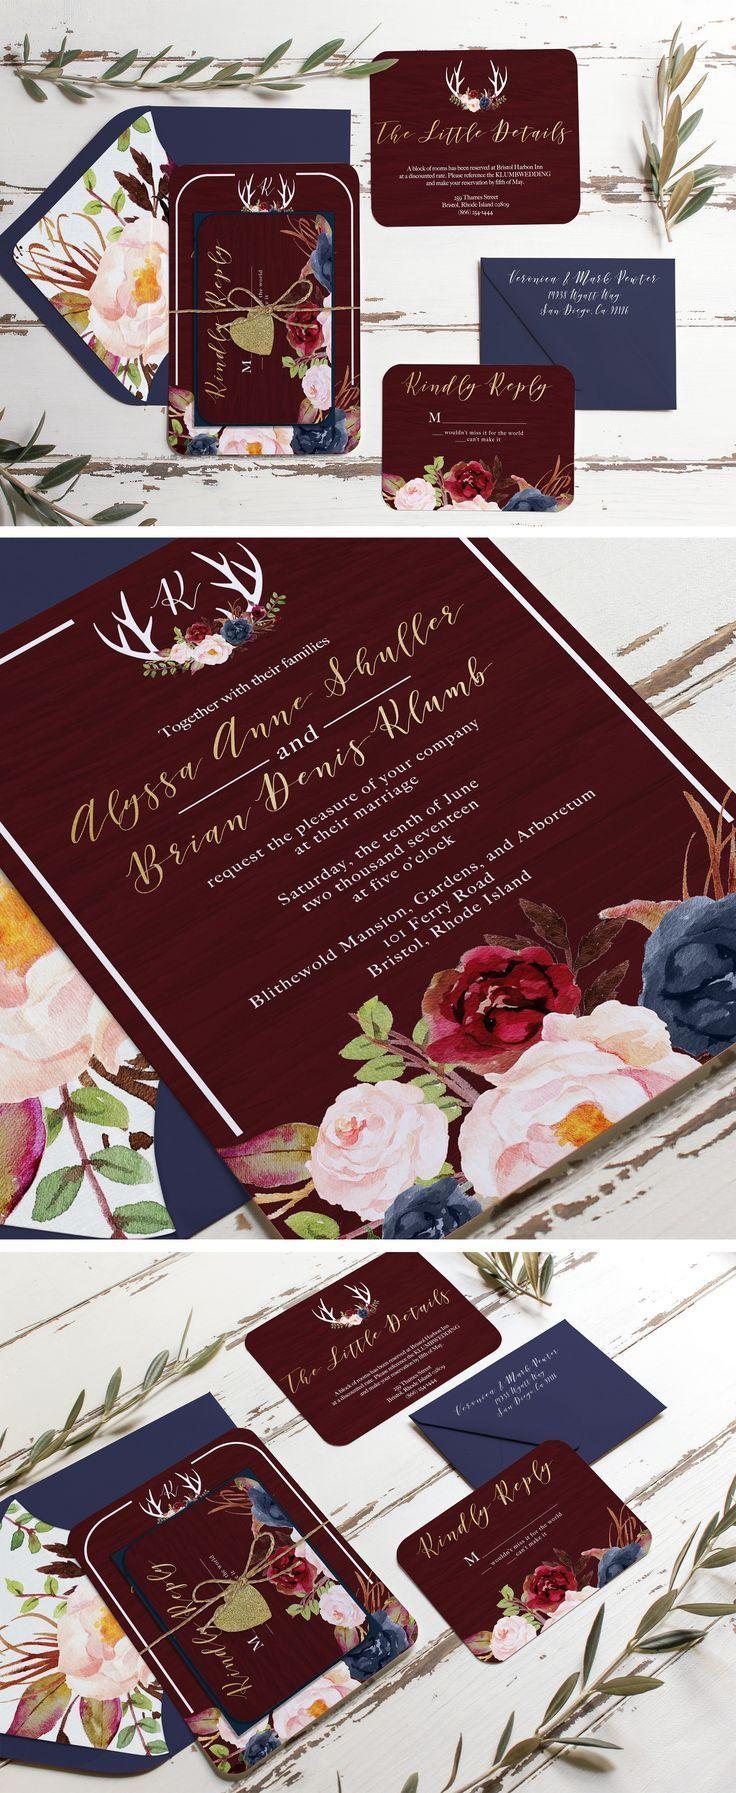 confetti daydreams wedding invitations%0A Marsala burgundy gold and navy rustic wedding invitation  Unica Forma makes  custom invitations like this